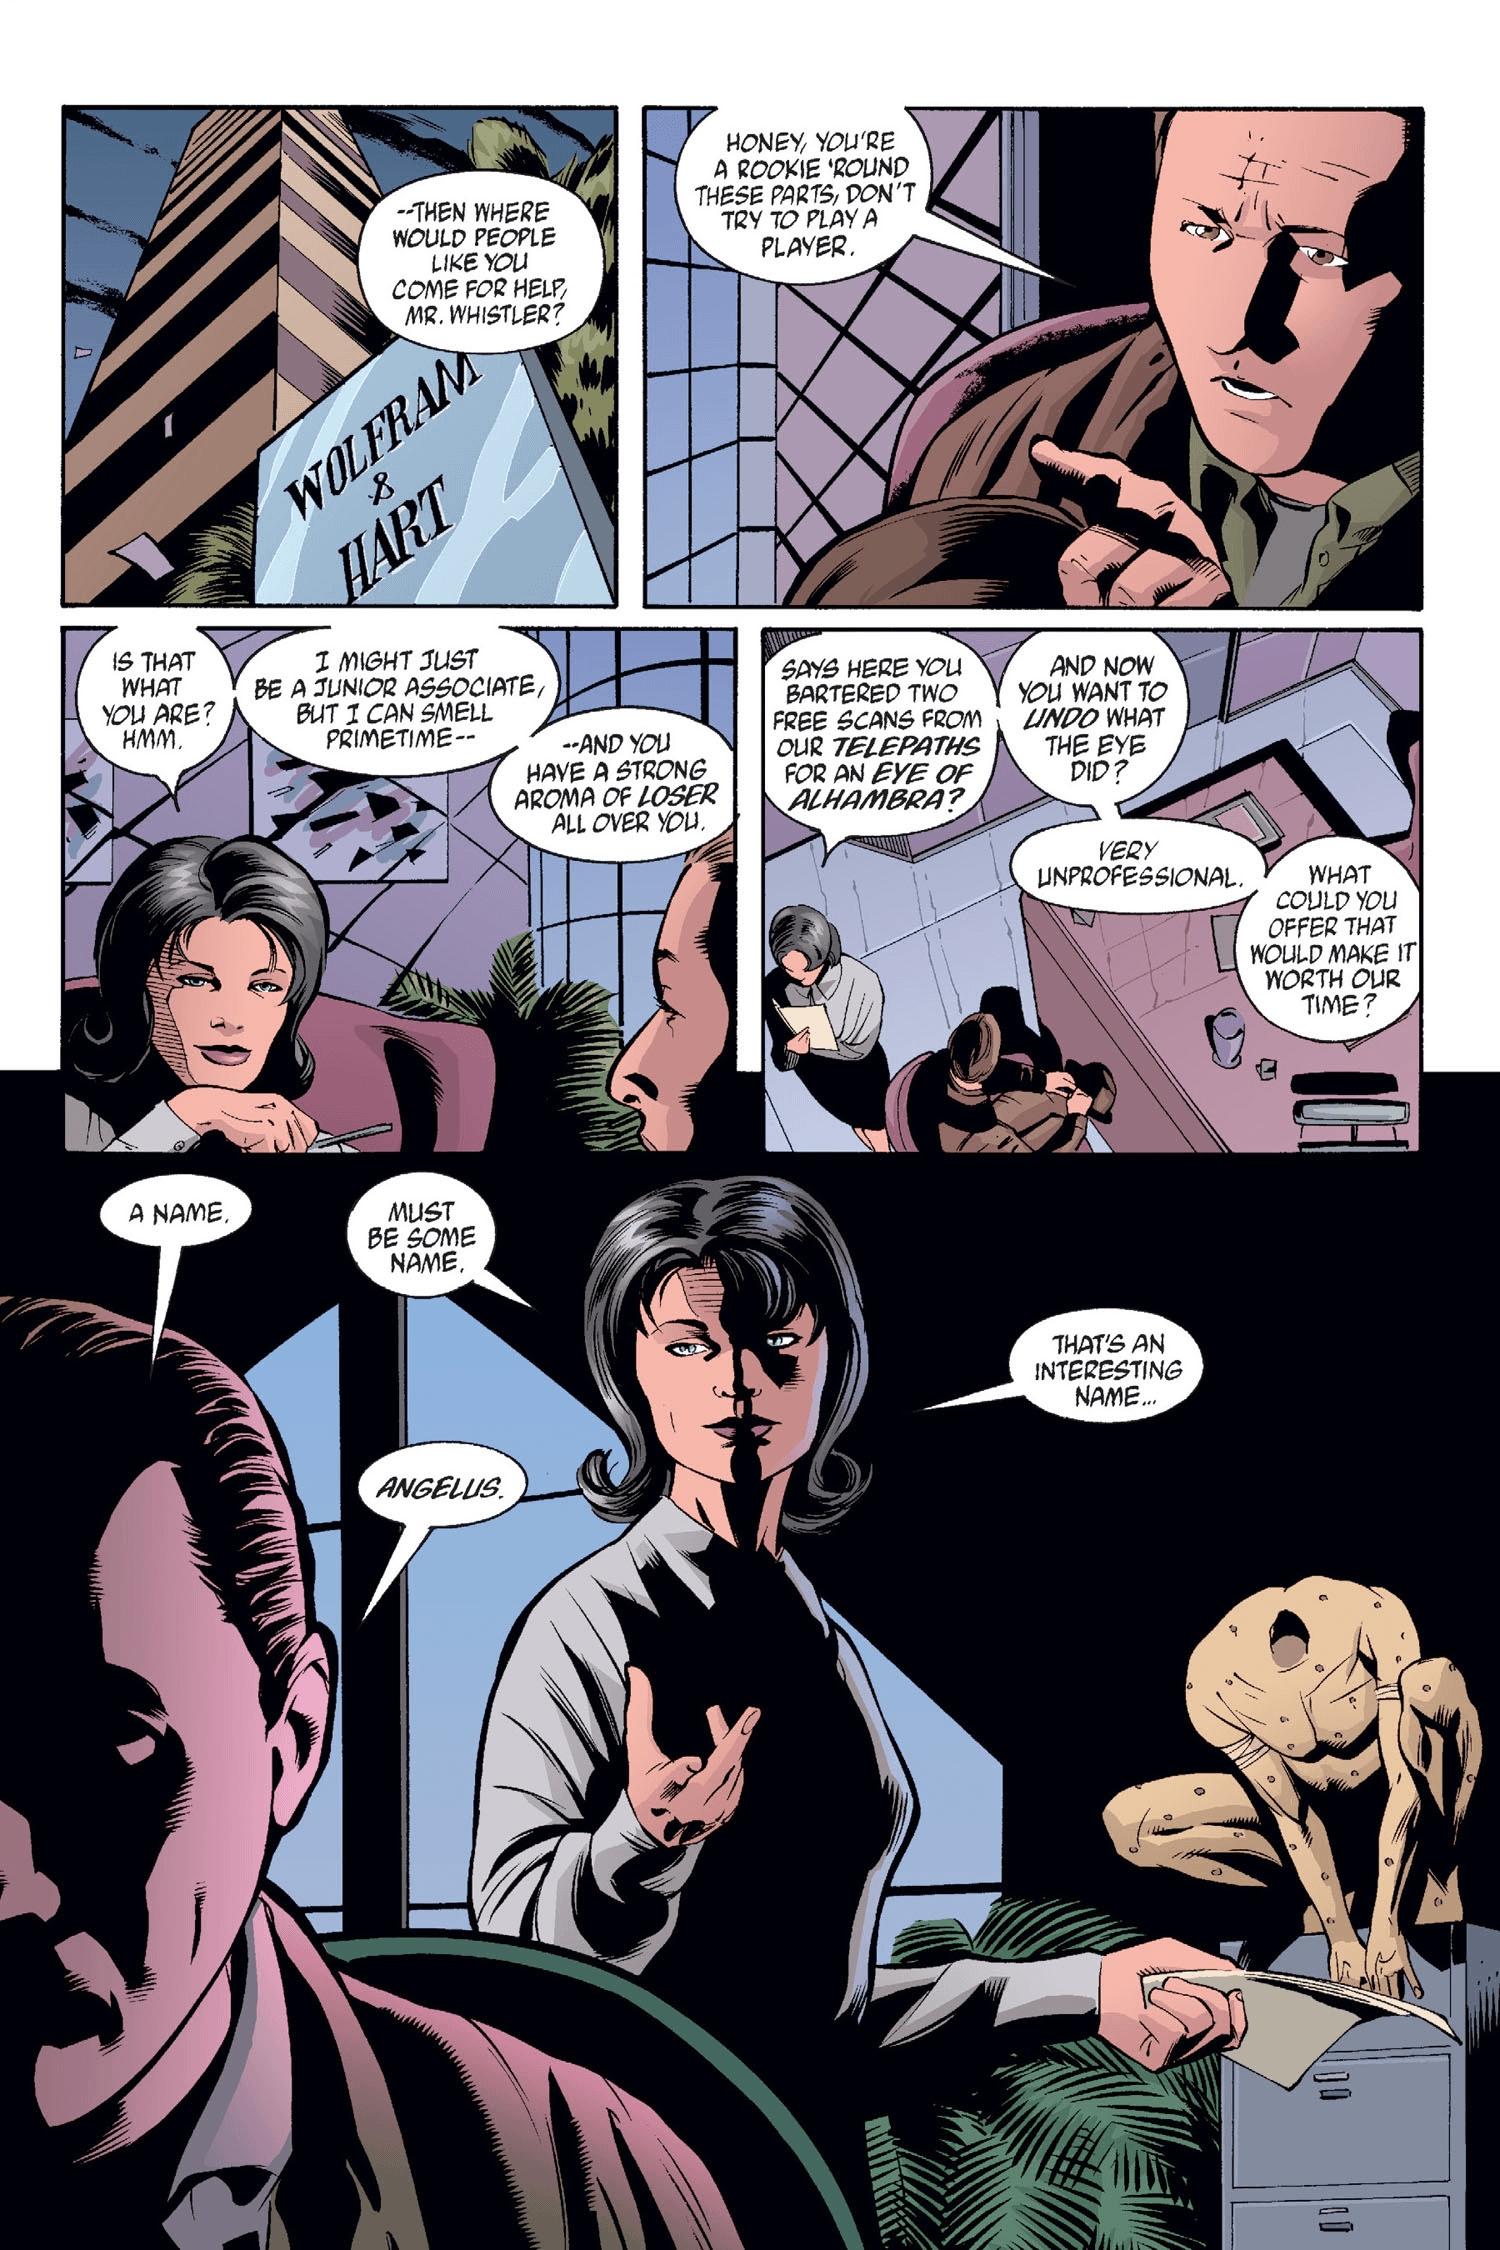 Read online Buffy the Vampire Slayer: Omnibus comic -  Issue # TPB 2 - 51